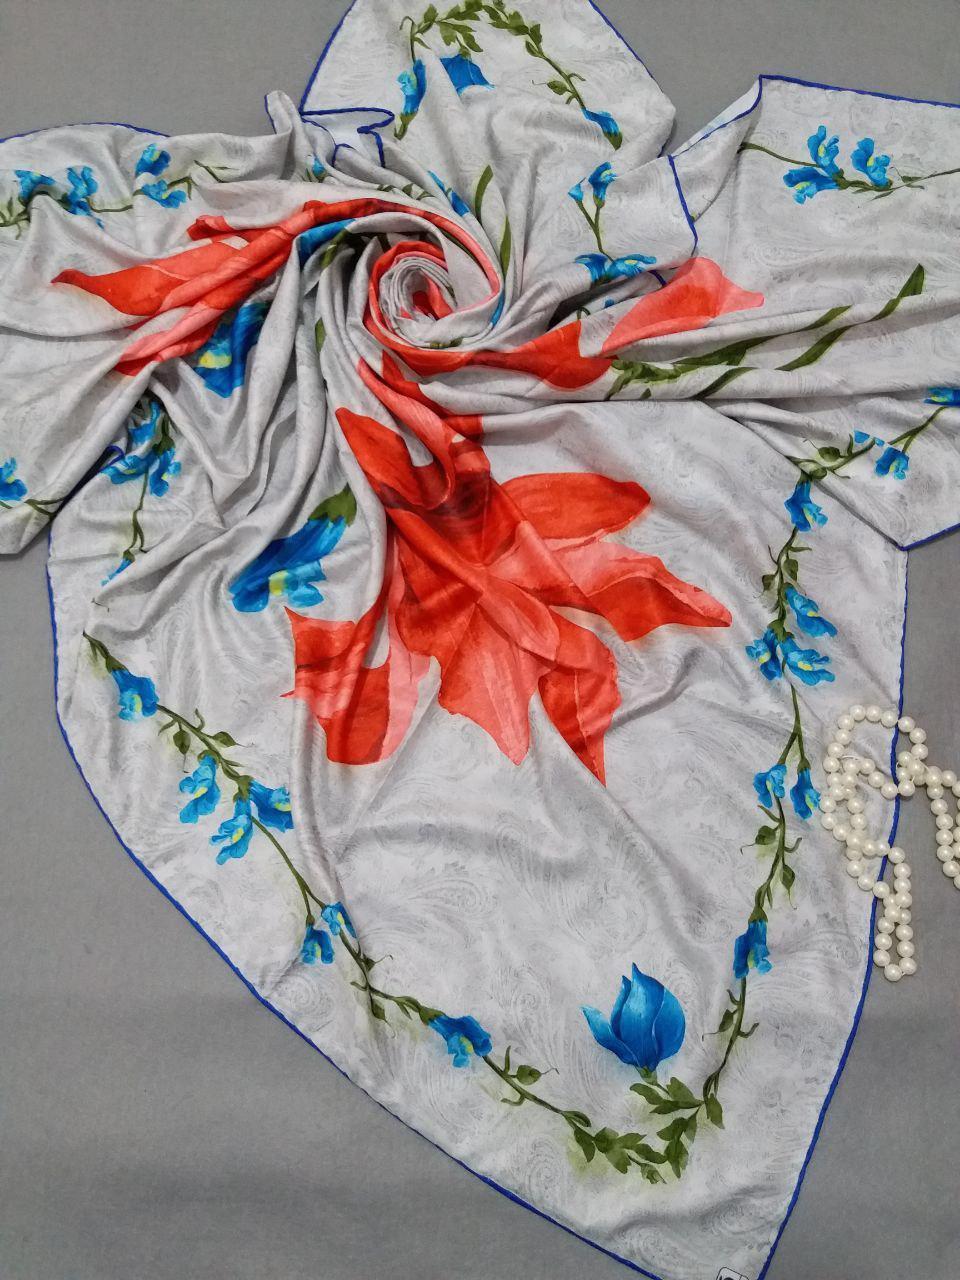 روسری ابریشم مدل جدید توییل کجراه sr-n259